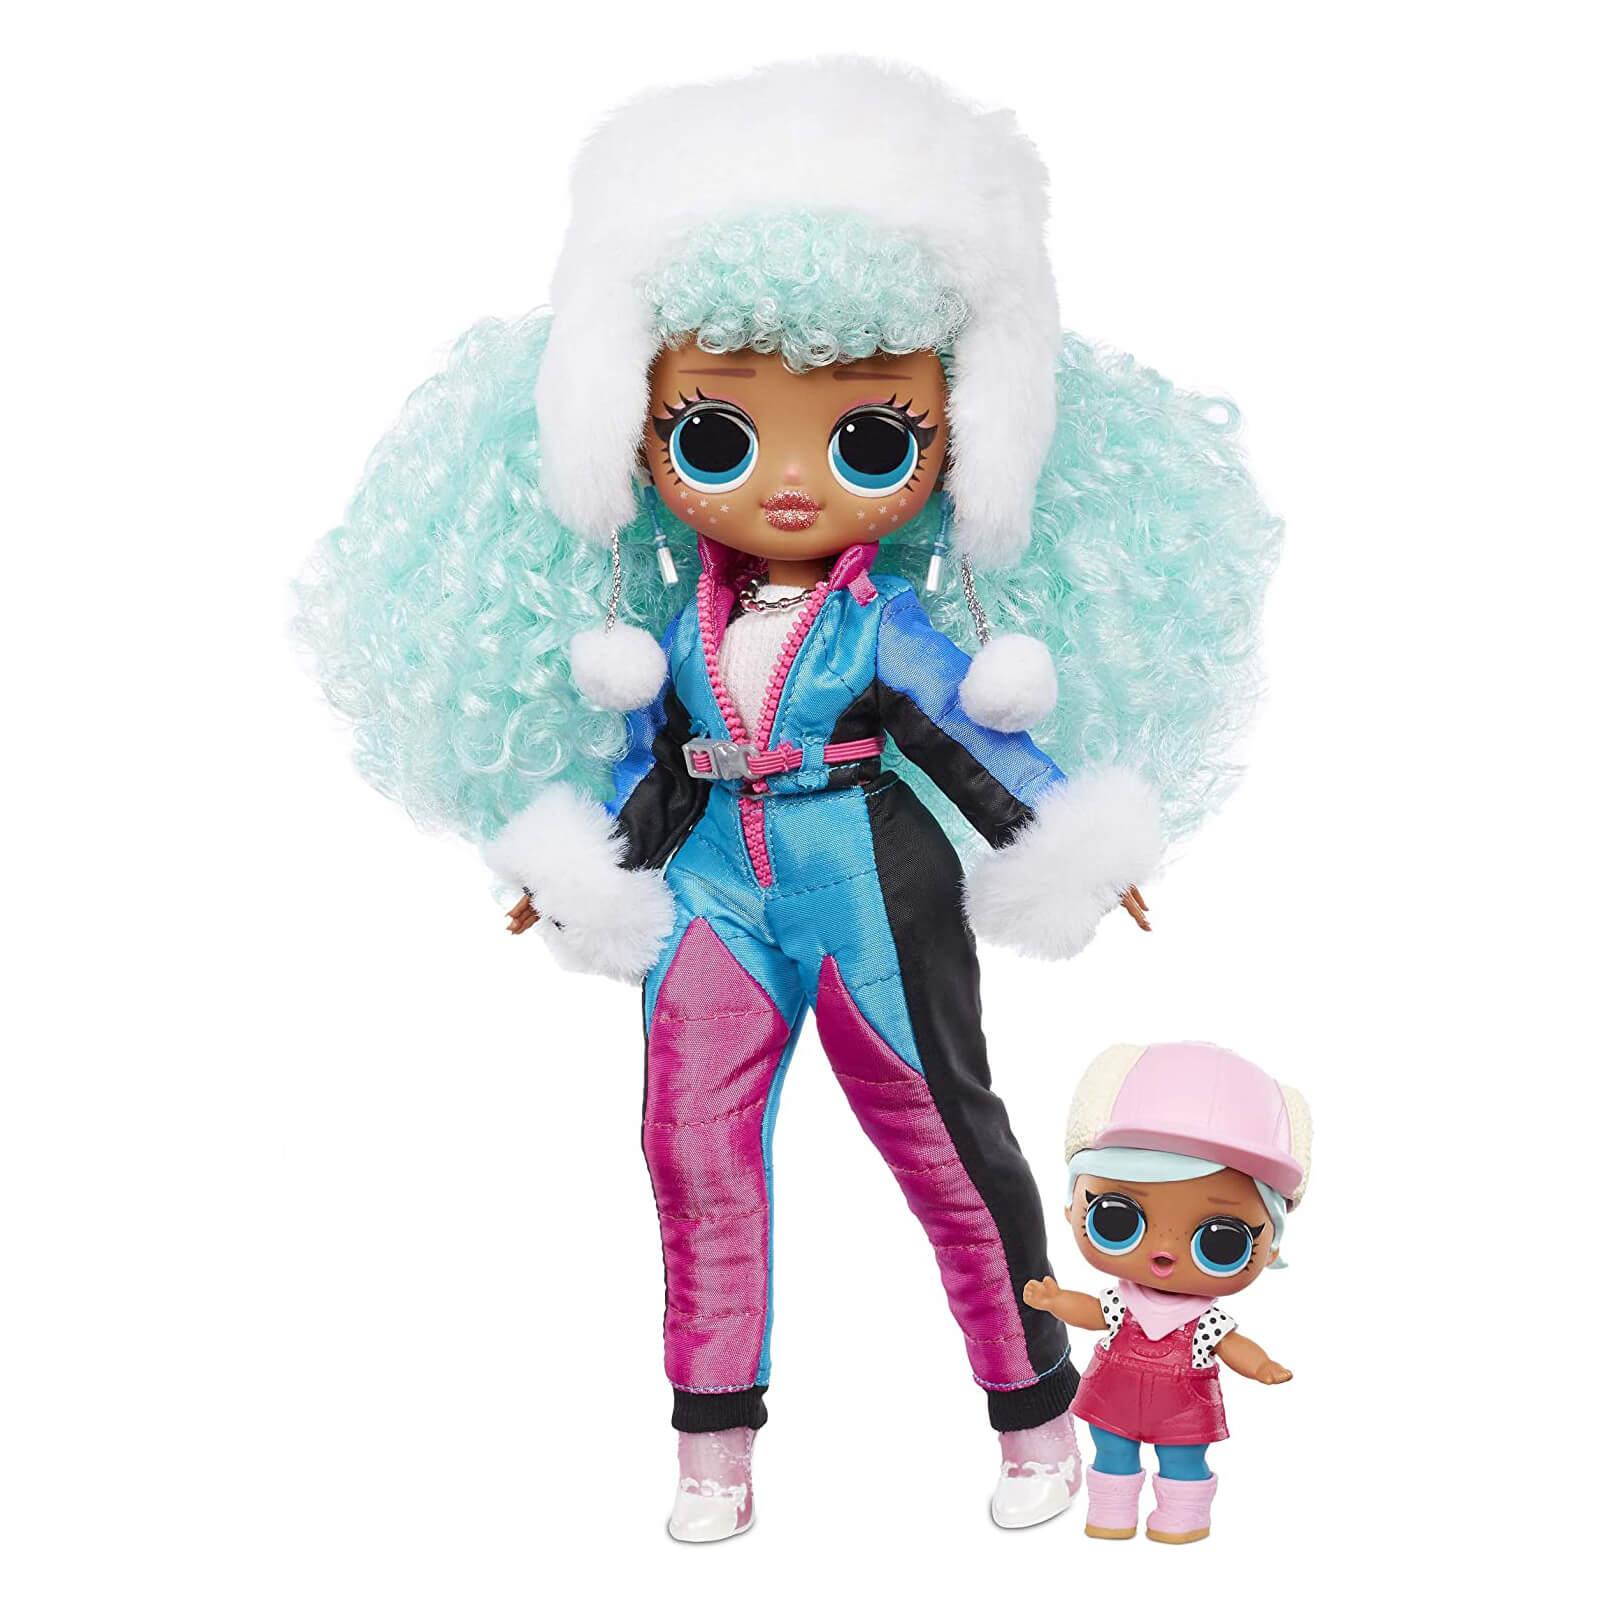 Кукла LOL Surprise LOL OMG Winter Chill Icy Gurl (ледяная девочка) Зимний отдых